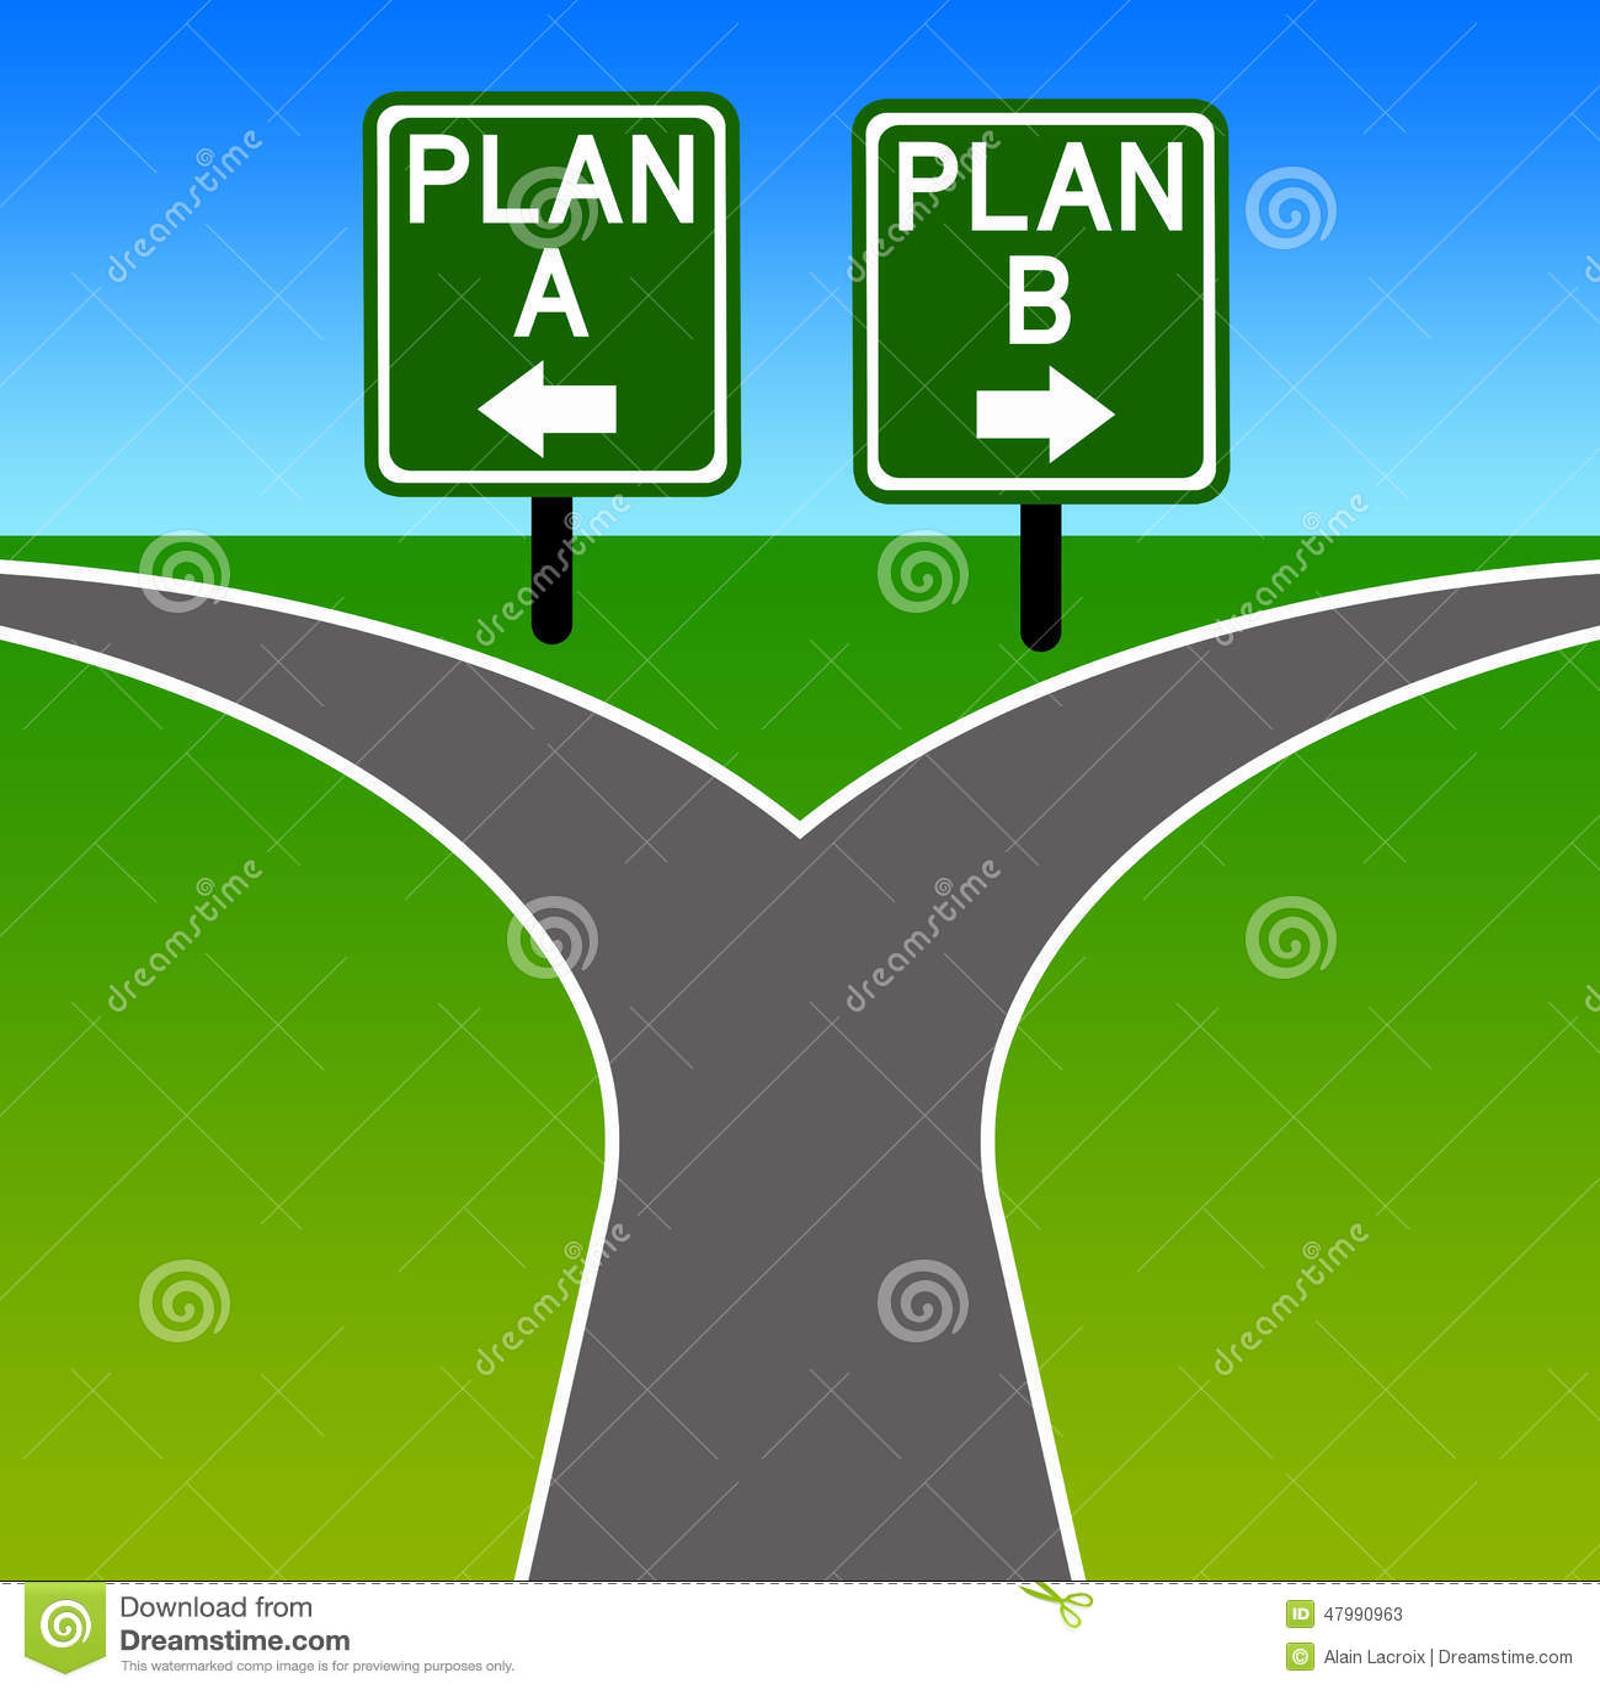 Alternative Plan Stock Illustration. Illustration Of